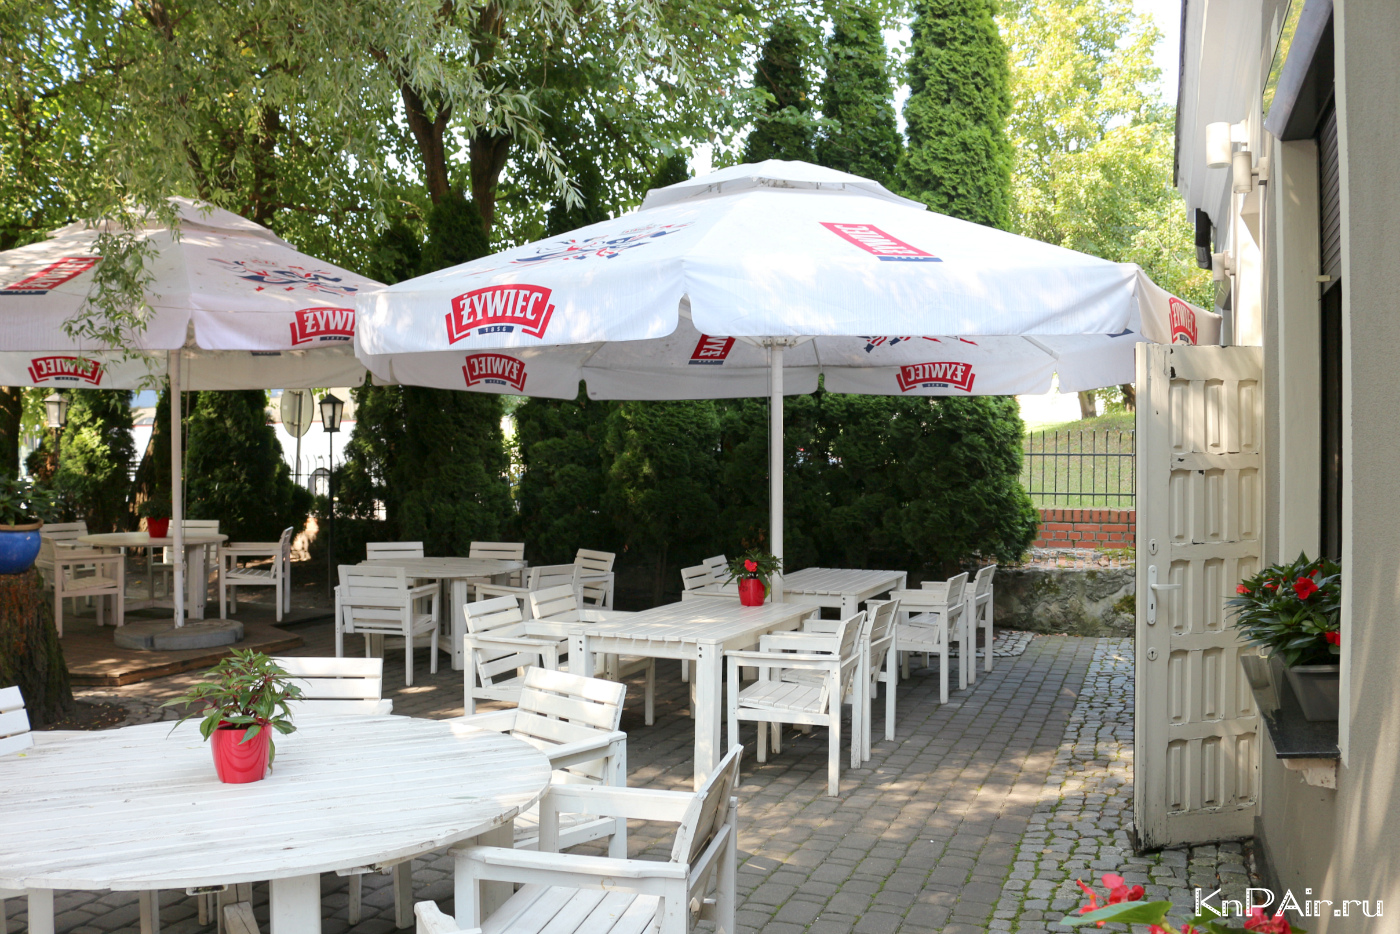 Restoran-Zajazd-pod-Zamkiem